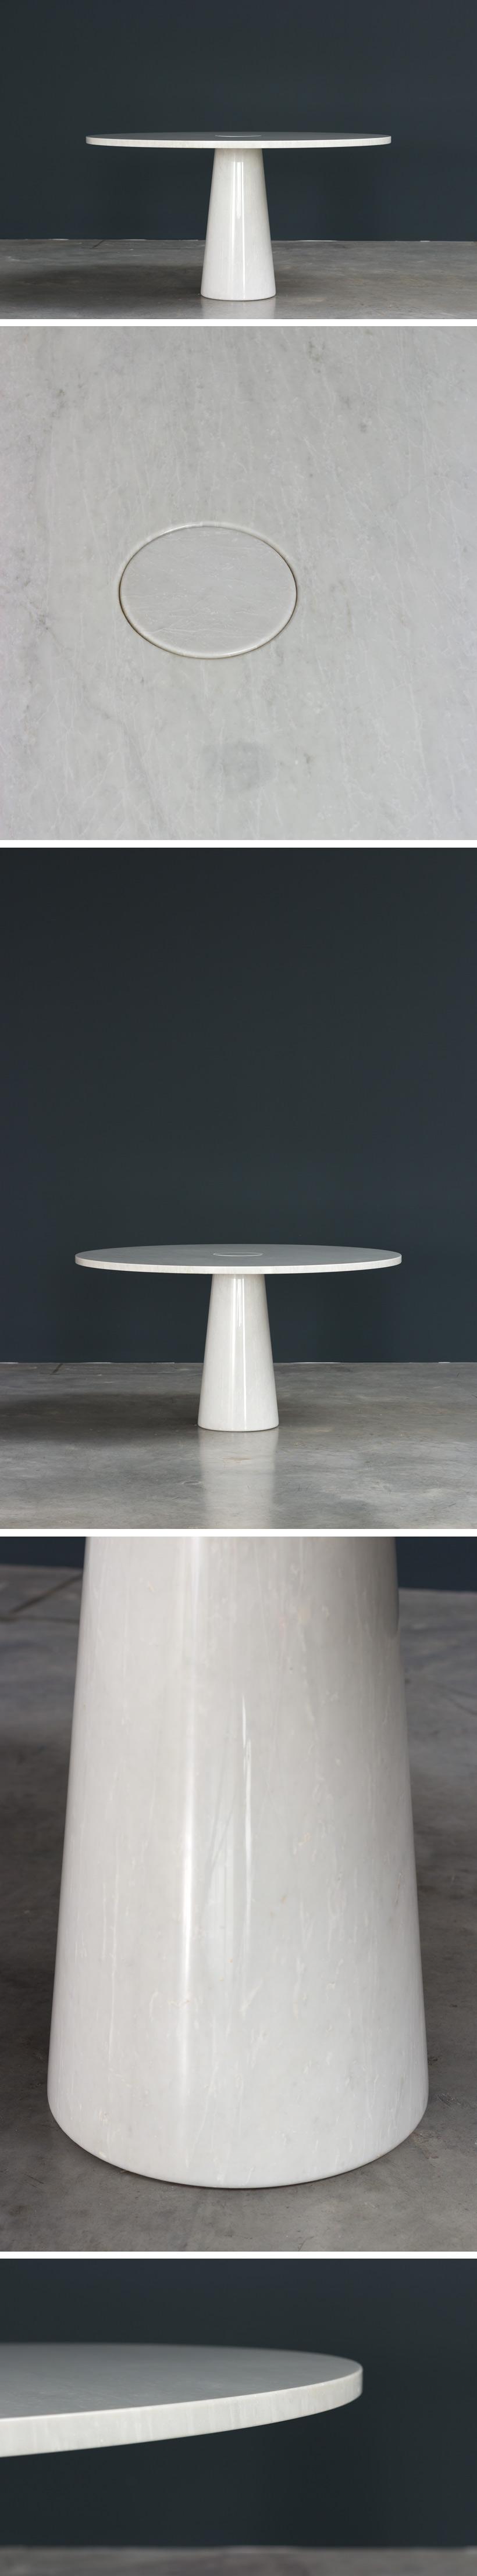 Angelo Mangiarotti Eros Carrara marble dinning table Skipper Large